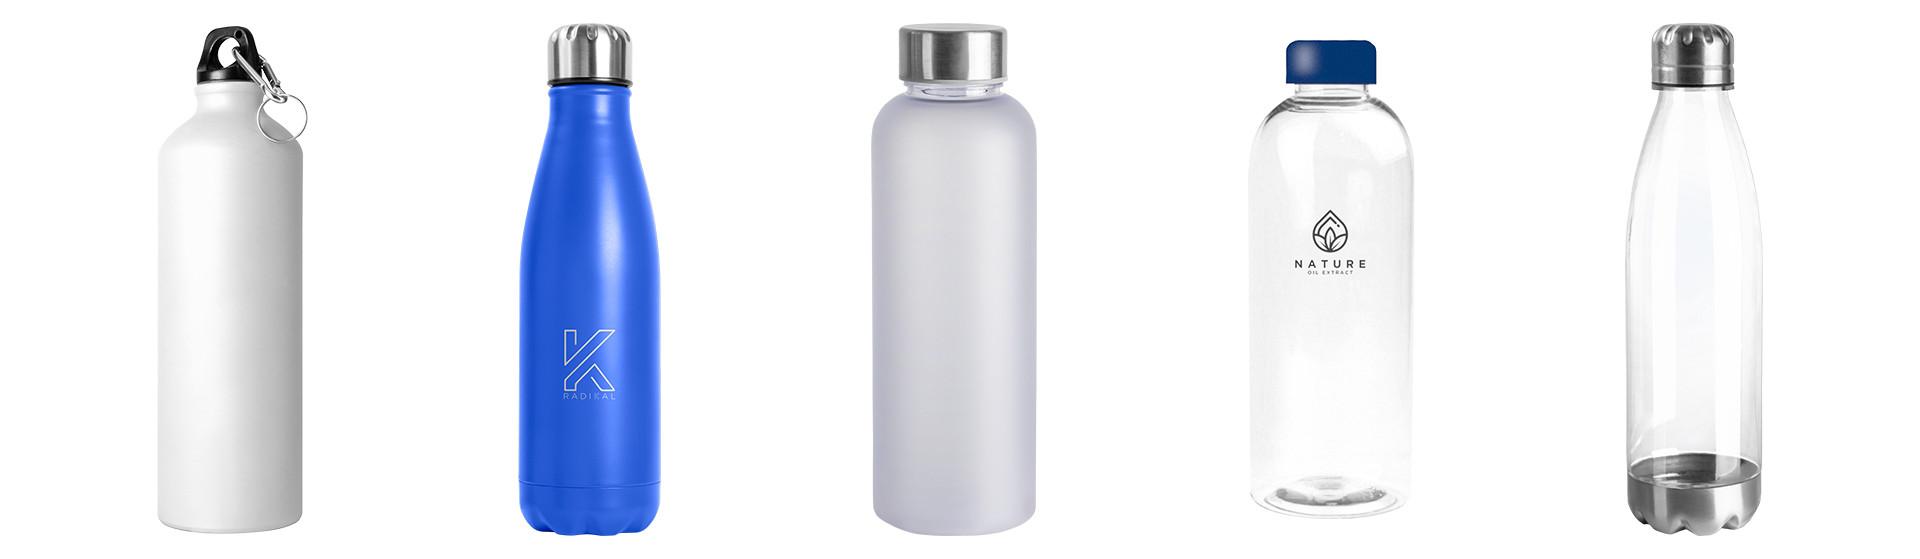 botellas1.jpg